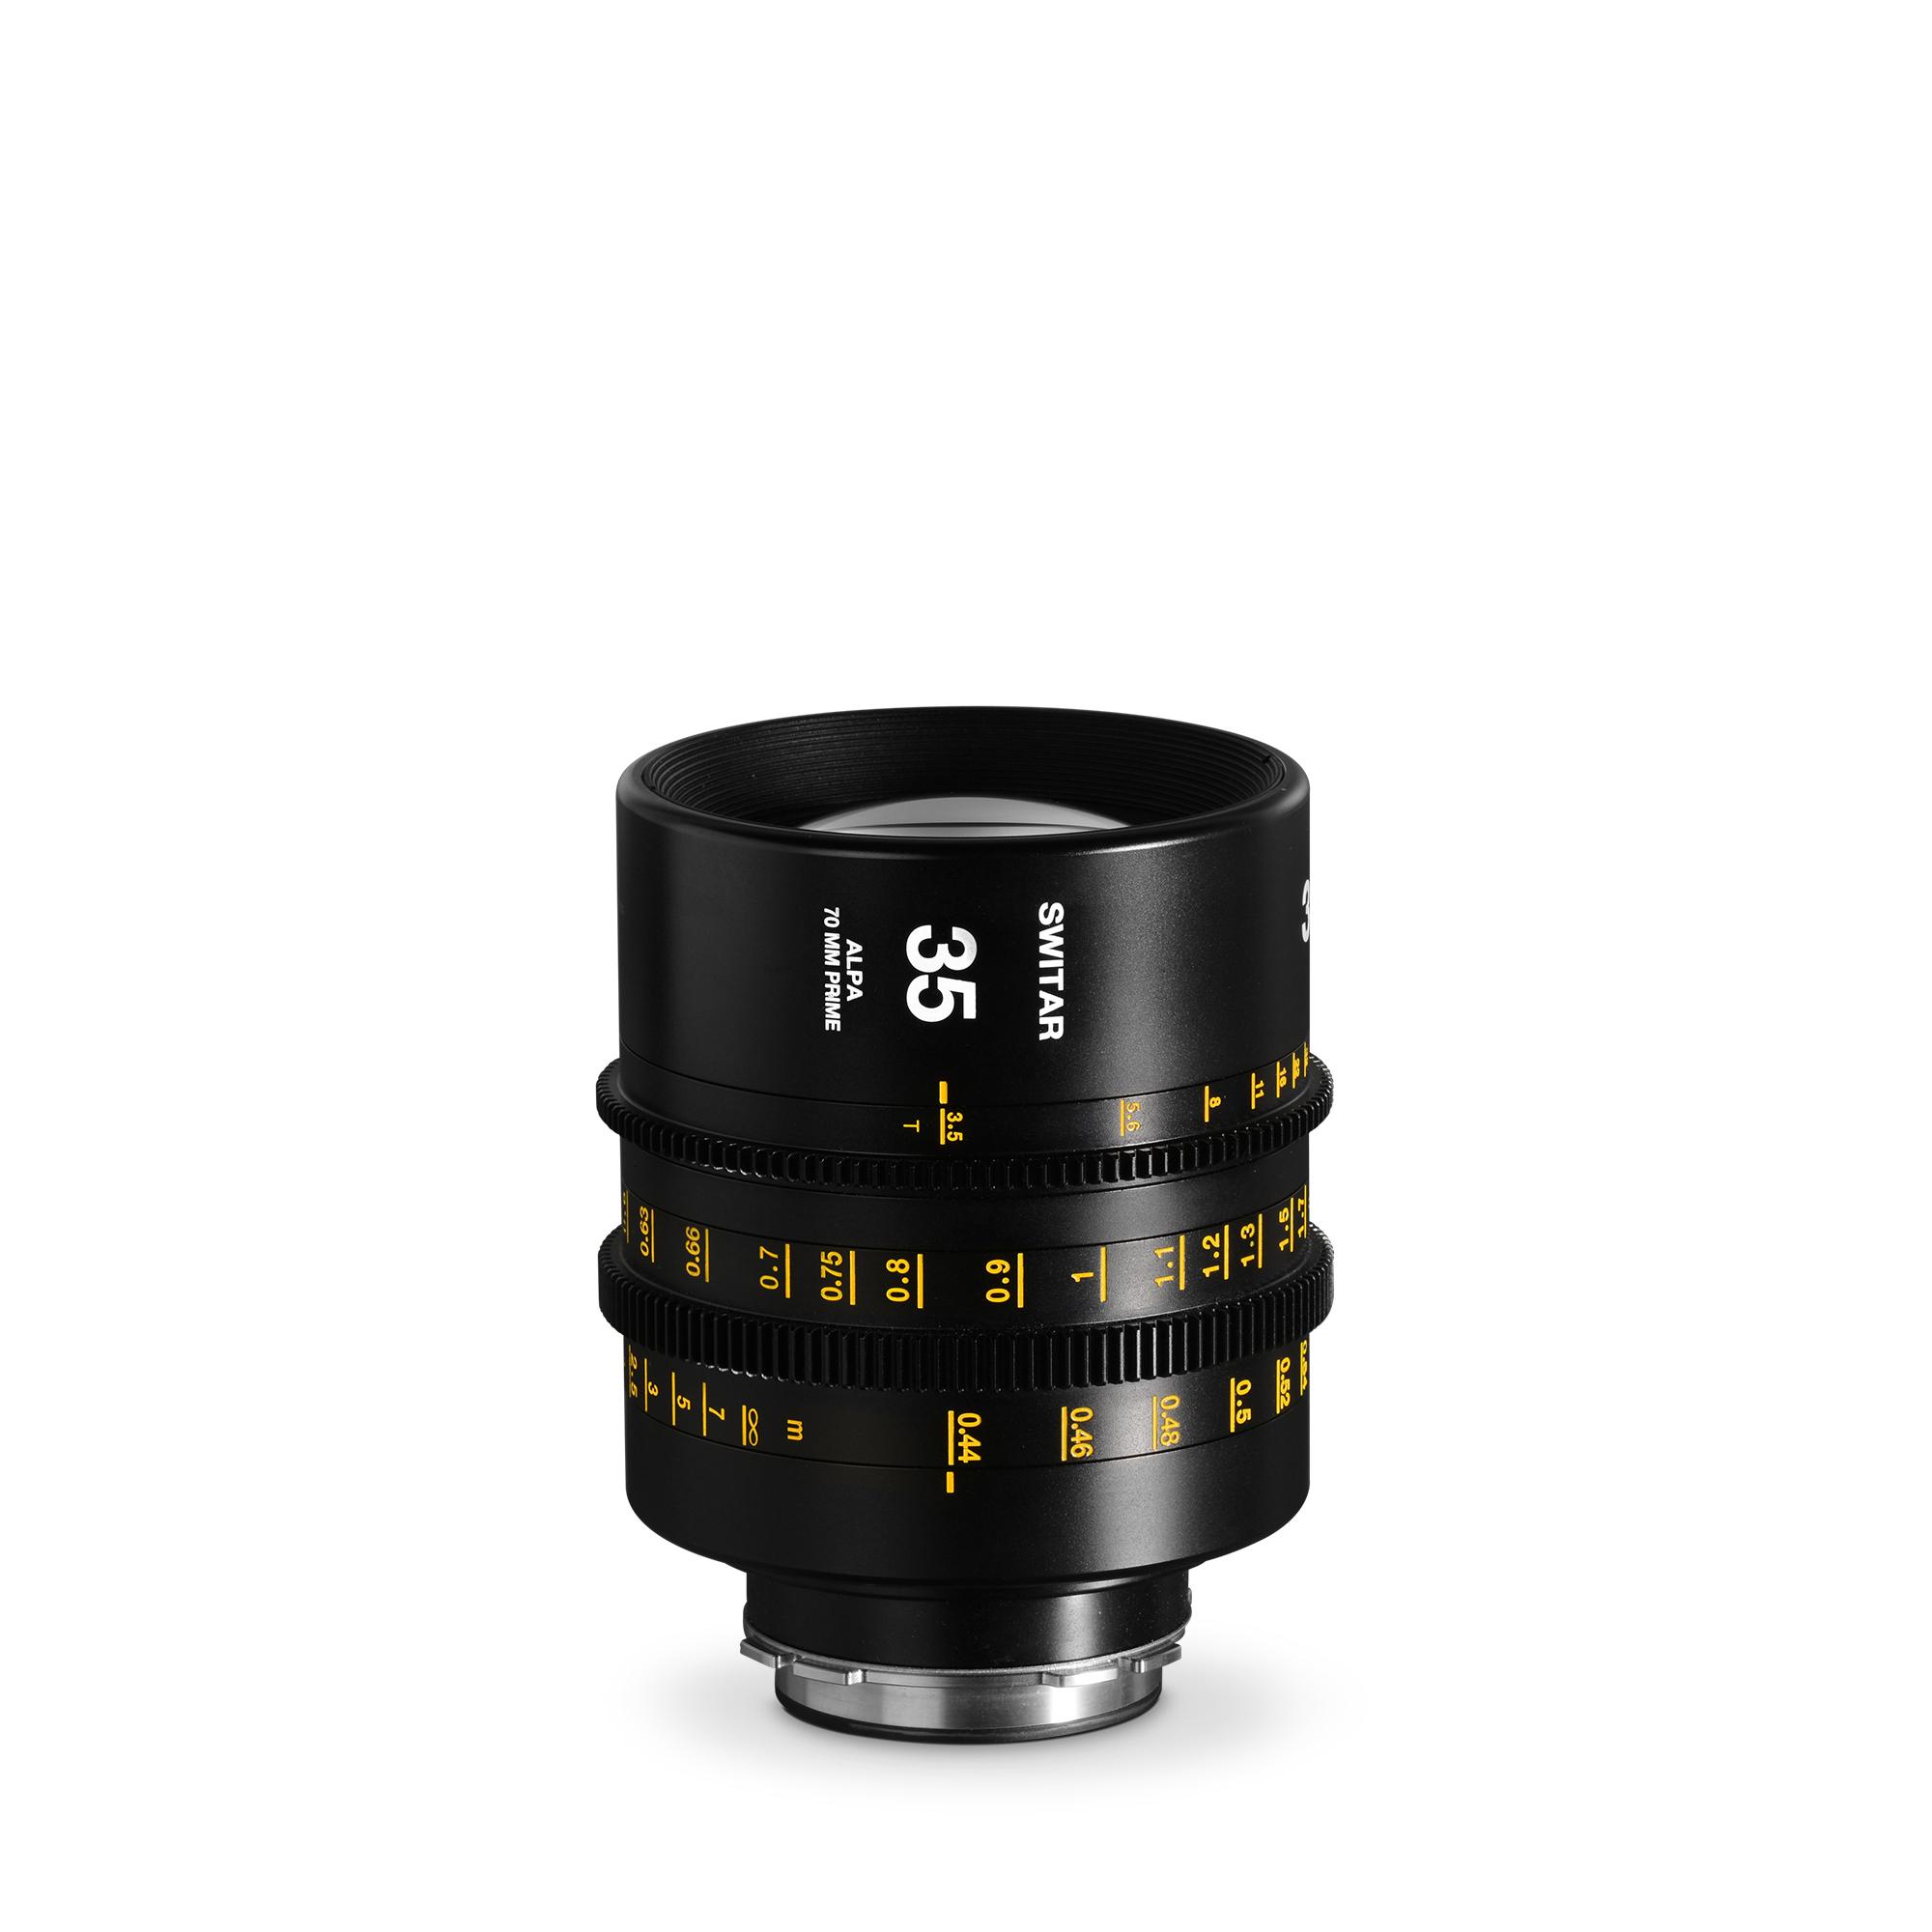 ALPA Коммутатор 3,5/35 мм Cine Prime IC 70 мм - метры